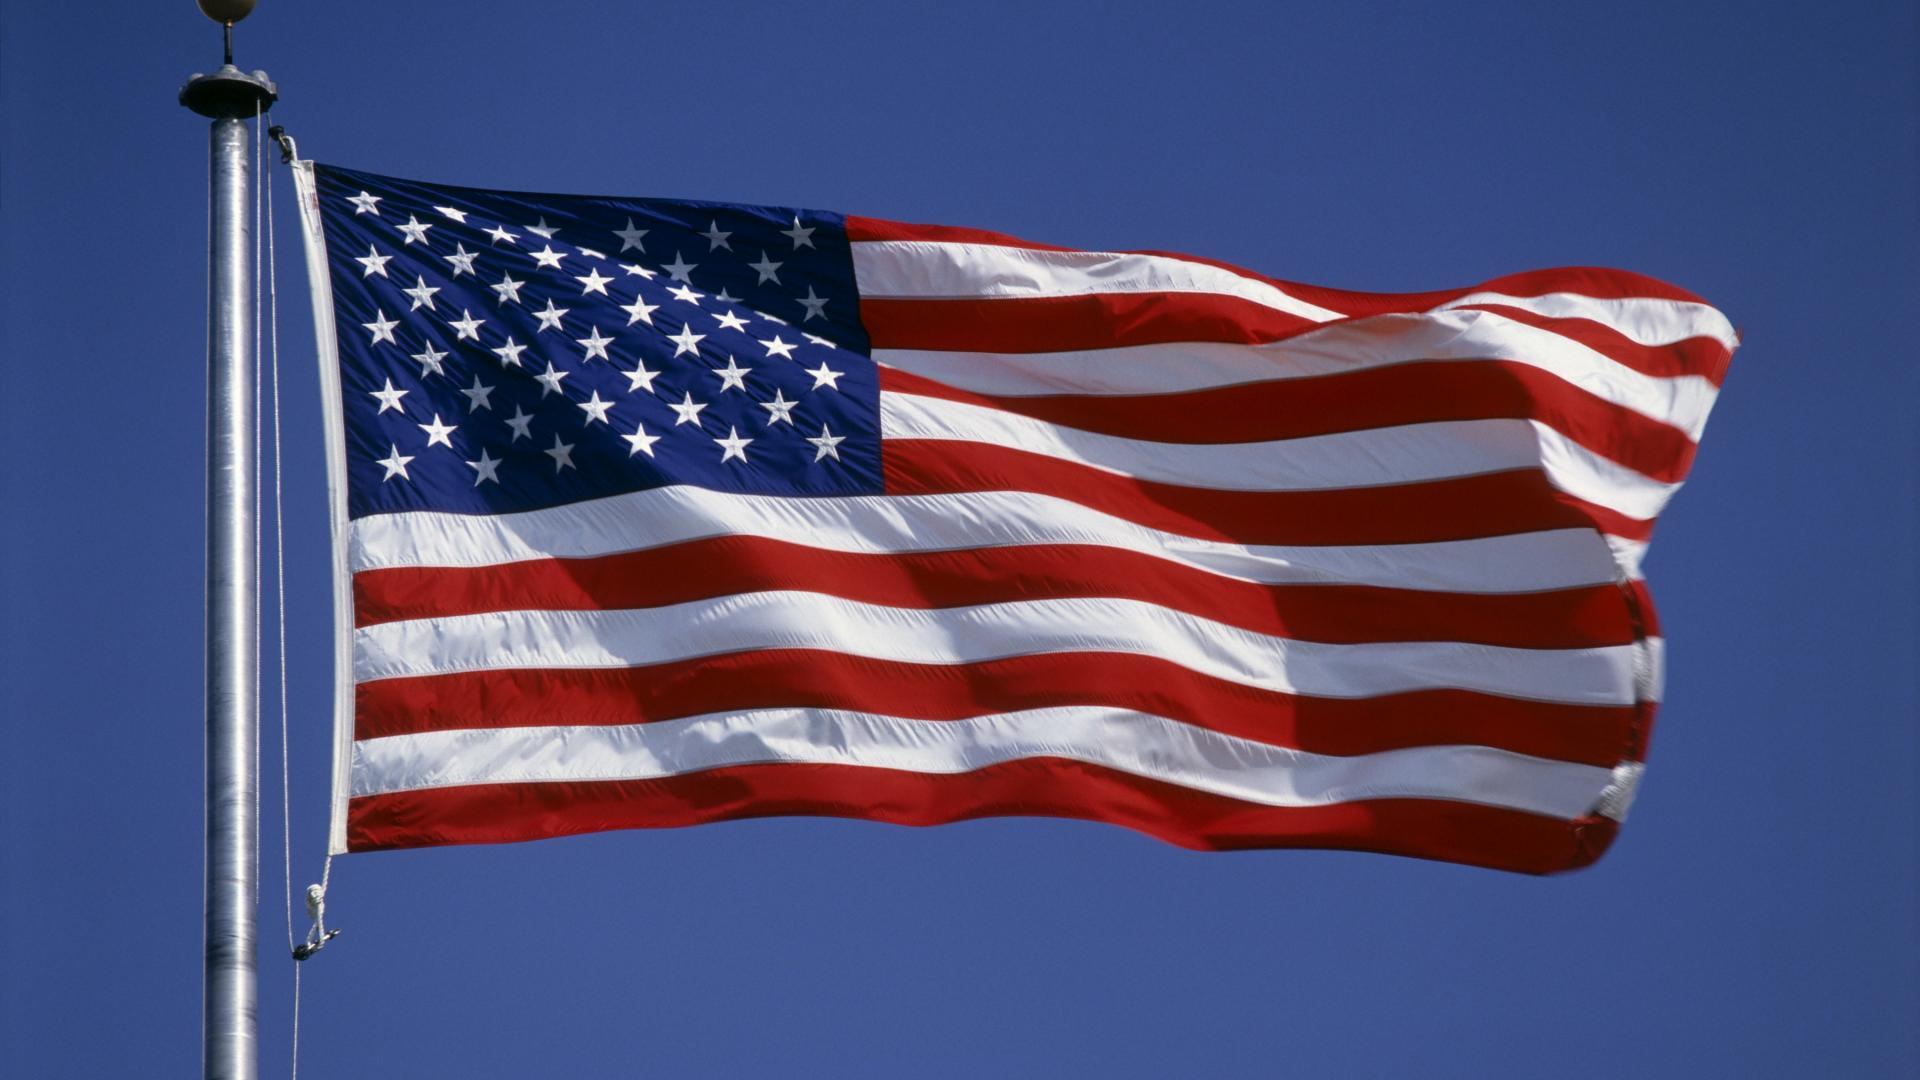 USA American Flag Desktop Wallpaper 1920x1080